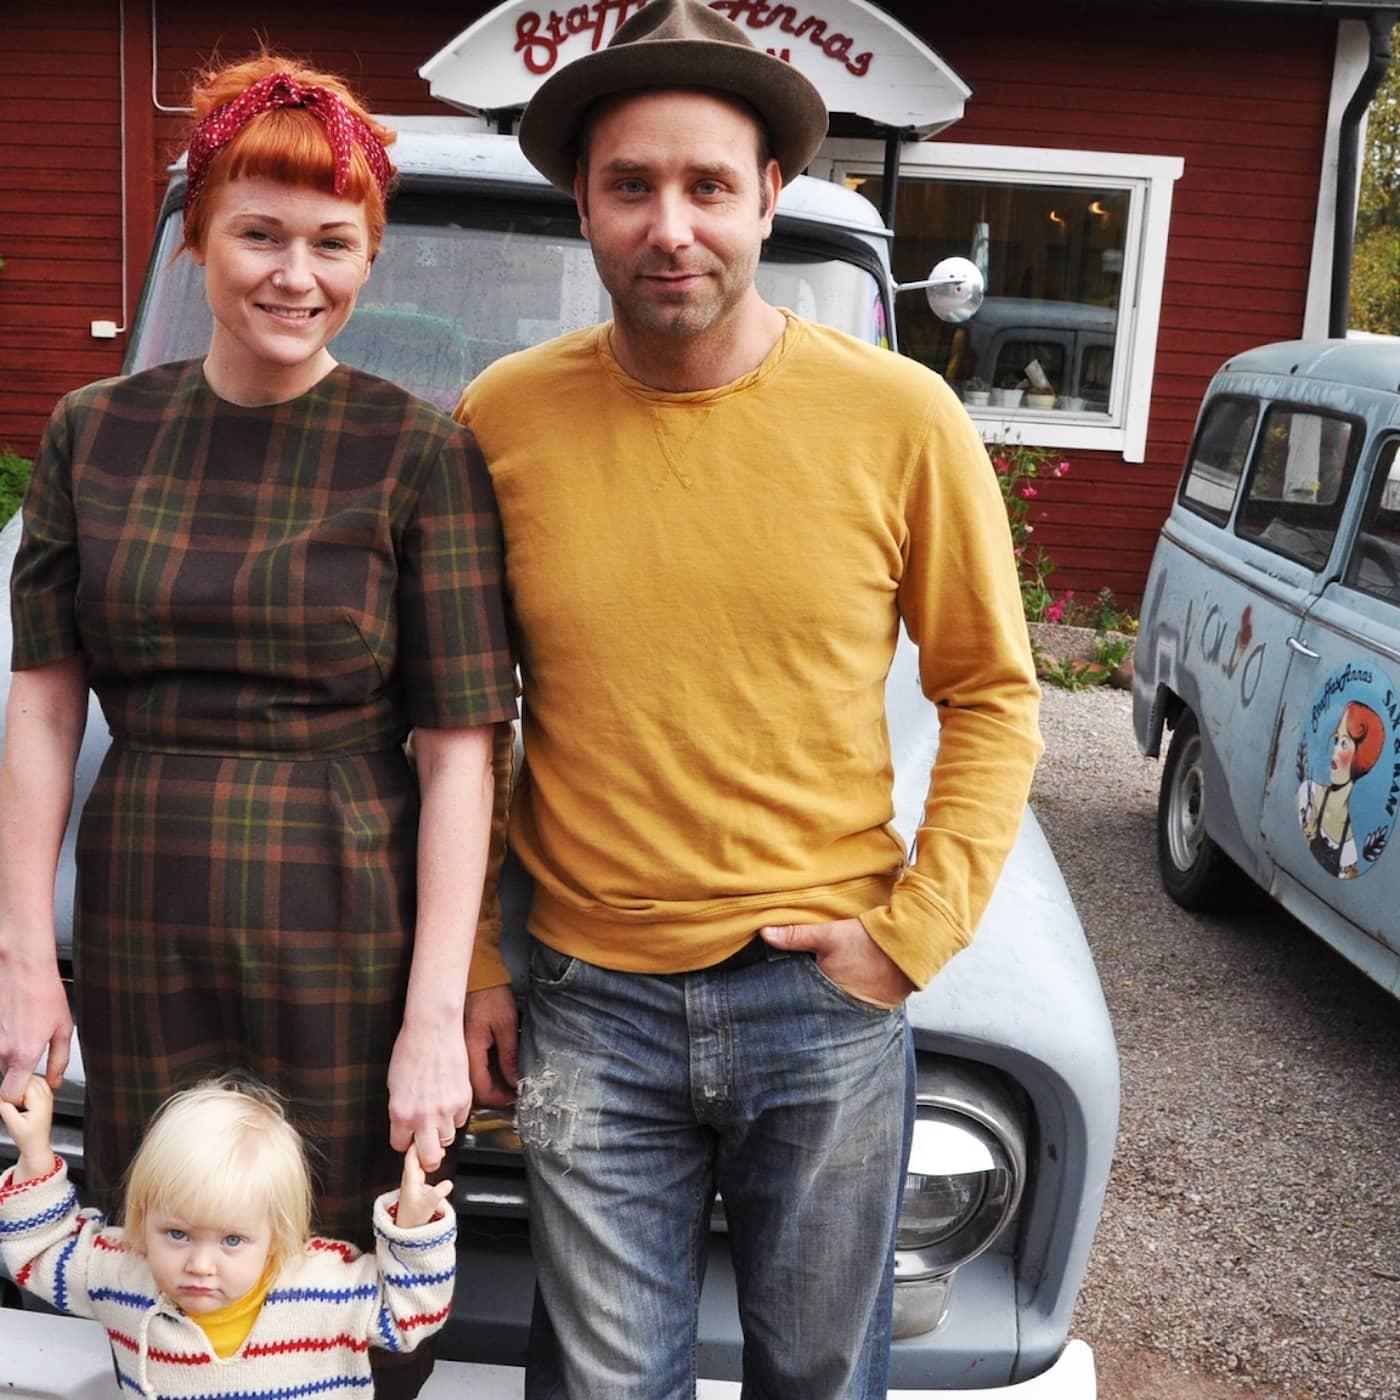 Pr Lovn, Bingsj Dalstugavgen 6, Enviken | unam.net